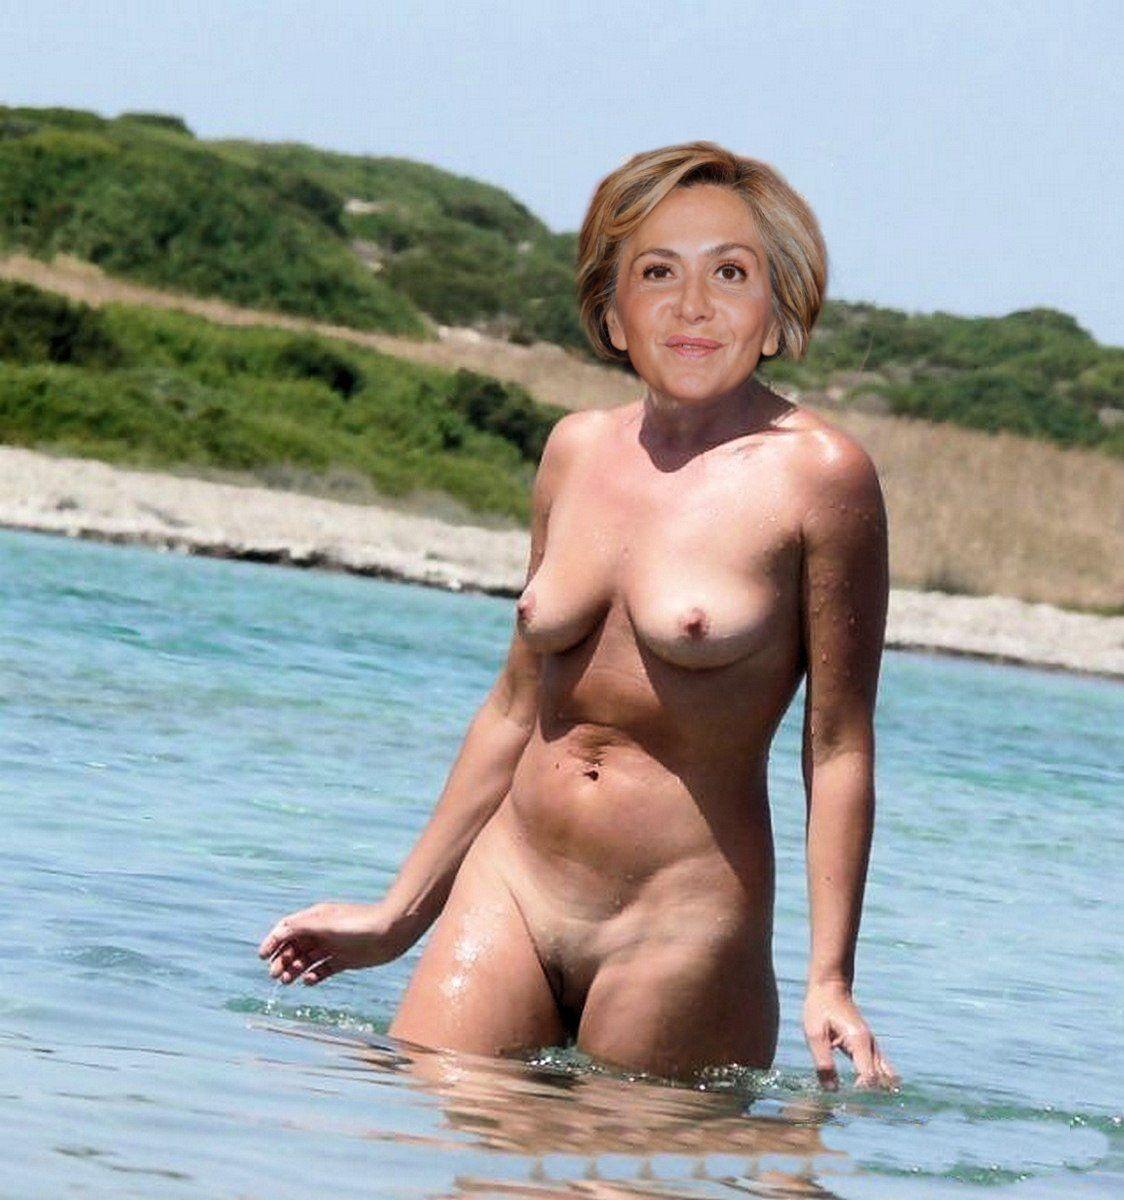 eva a nude beach